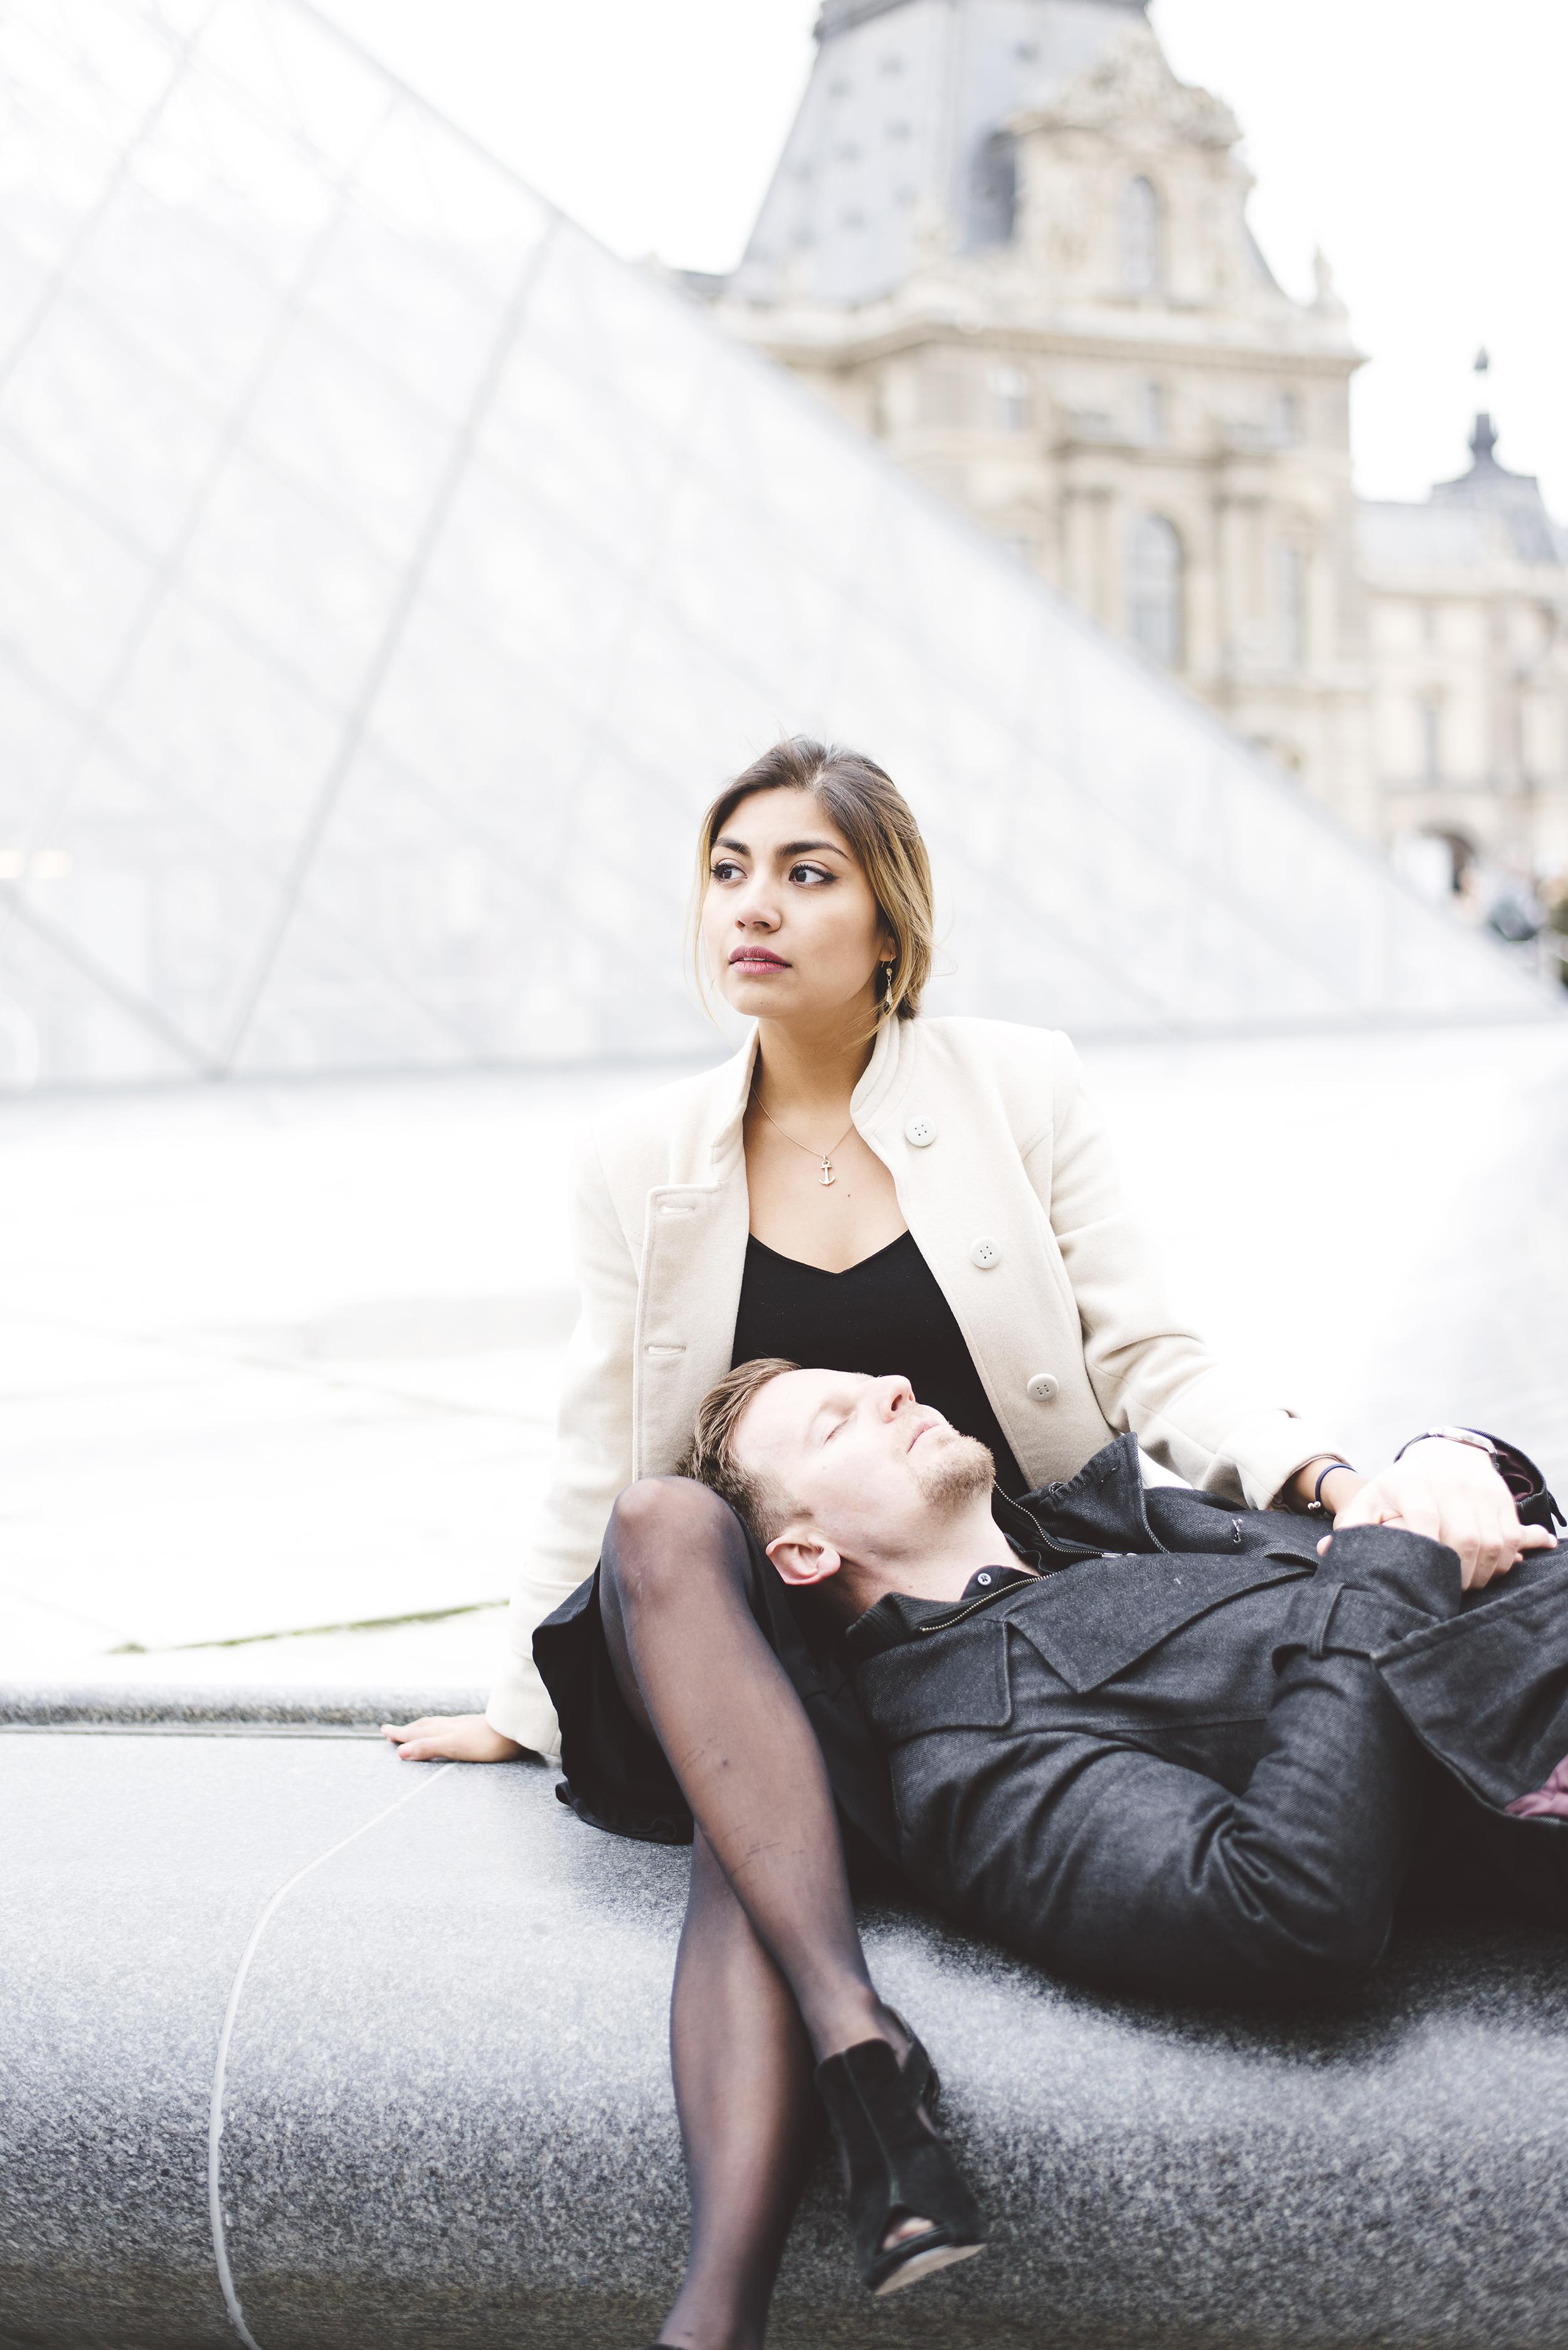 Couple-photoshoot-Anniversary-Paris-Louvre-Tuileries072.jpg